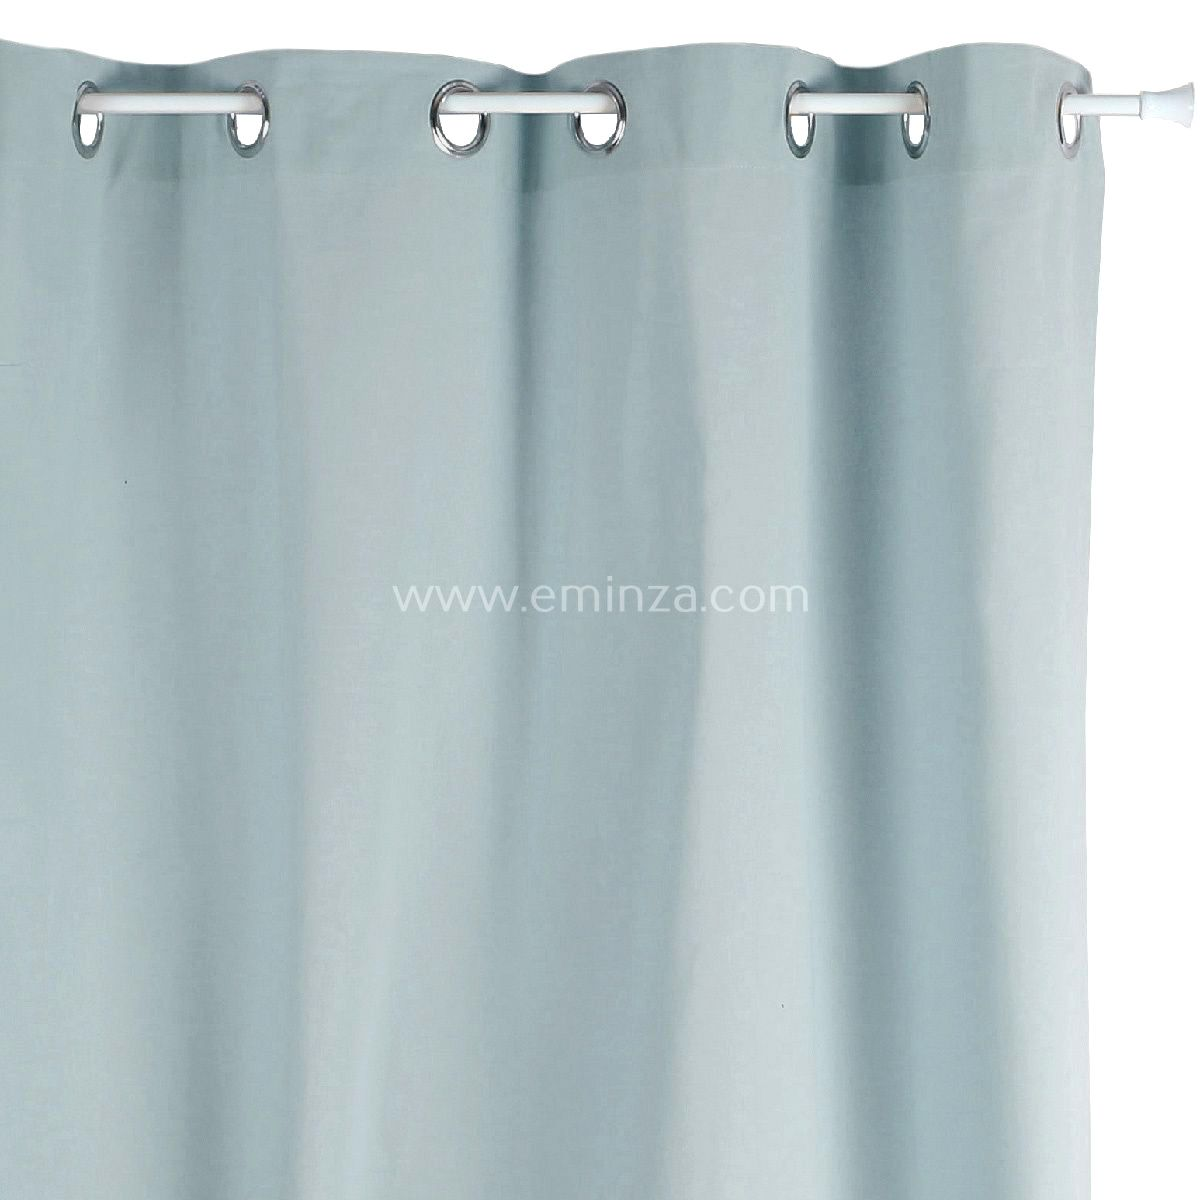 rideau tamisant 140 cm x h240 etna bleu gris rideau tamisant eminza. Black Bedroom Furniture Sets. Home Design Ideas